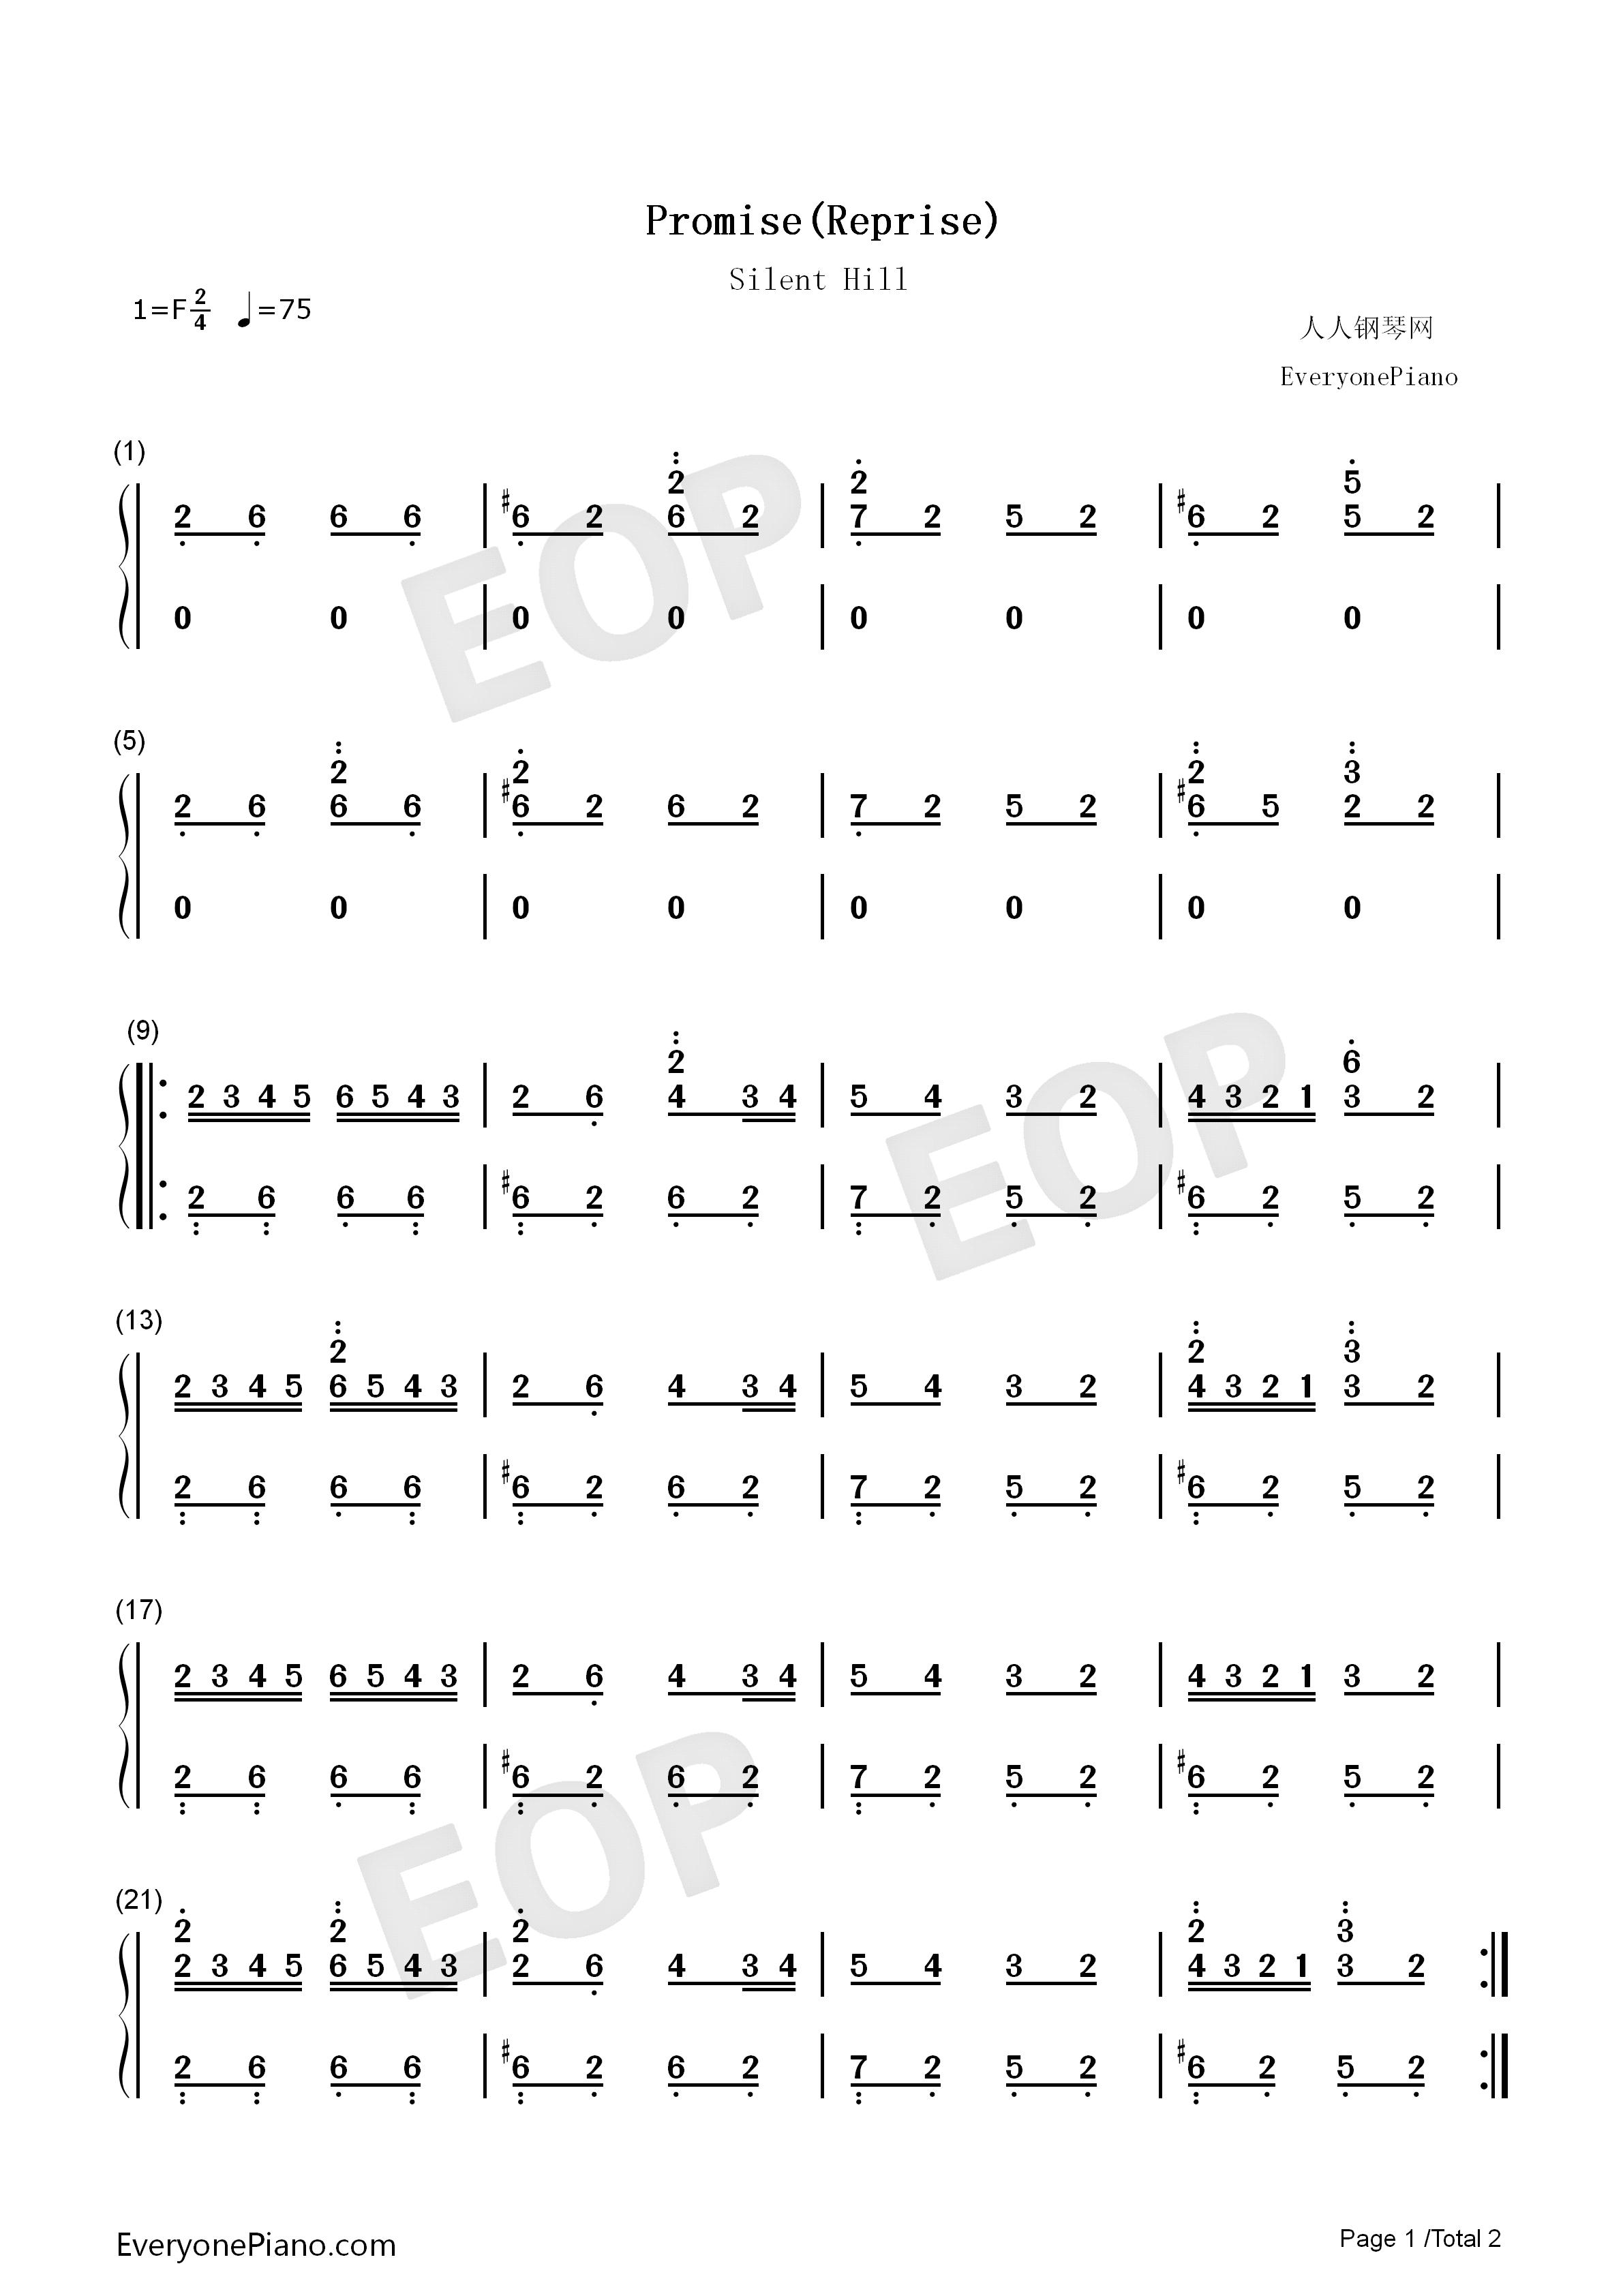 promise的用法_promise(reprise)-寂静岭-eop教学曲双手简谱预览